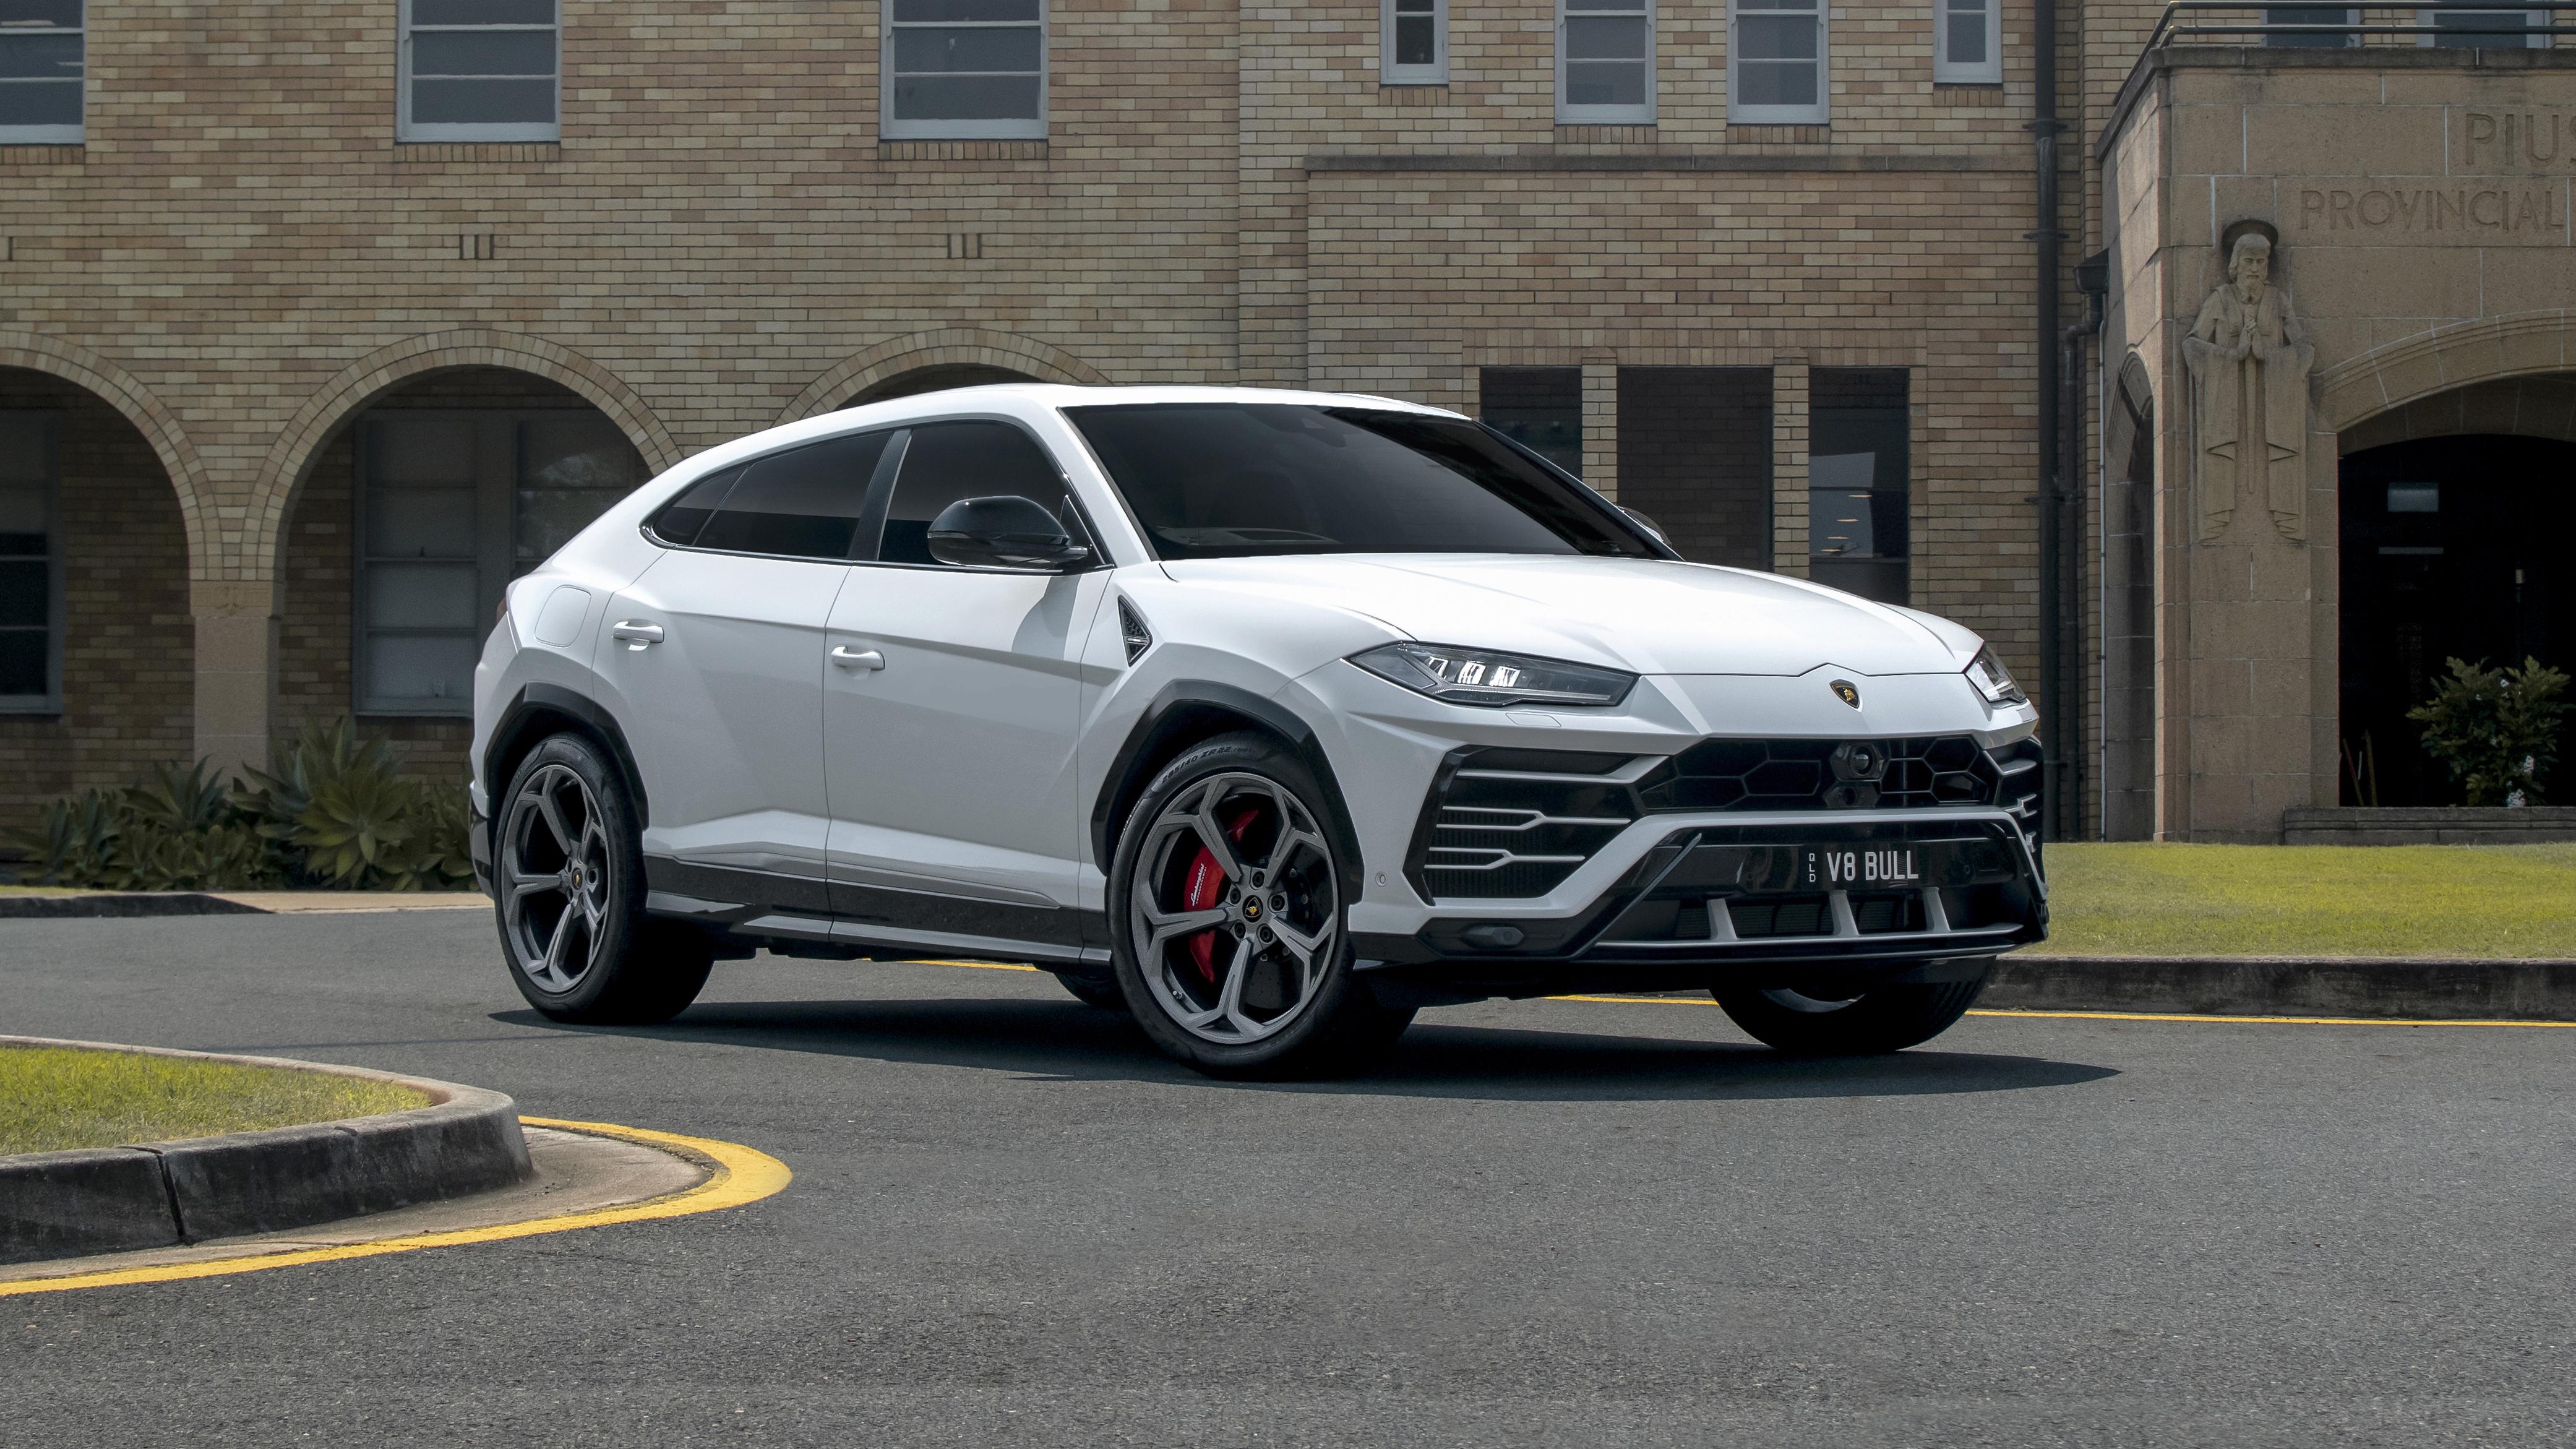 2019 20 Lamborghini Urus Suv Models Recalled For Potential Fire Risk Caradvice